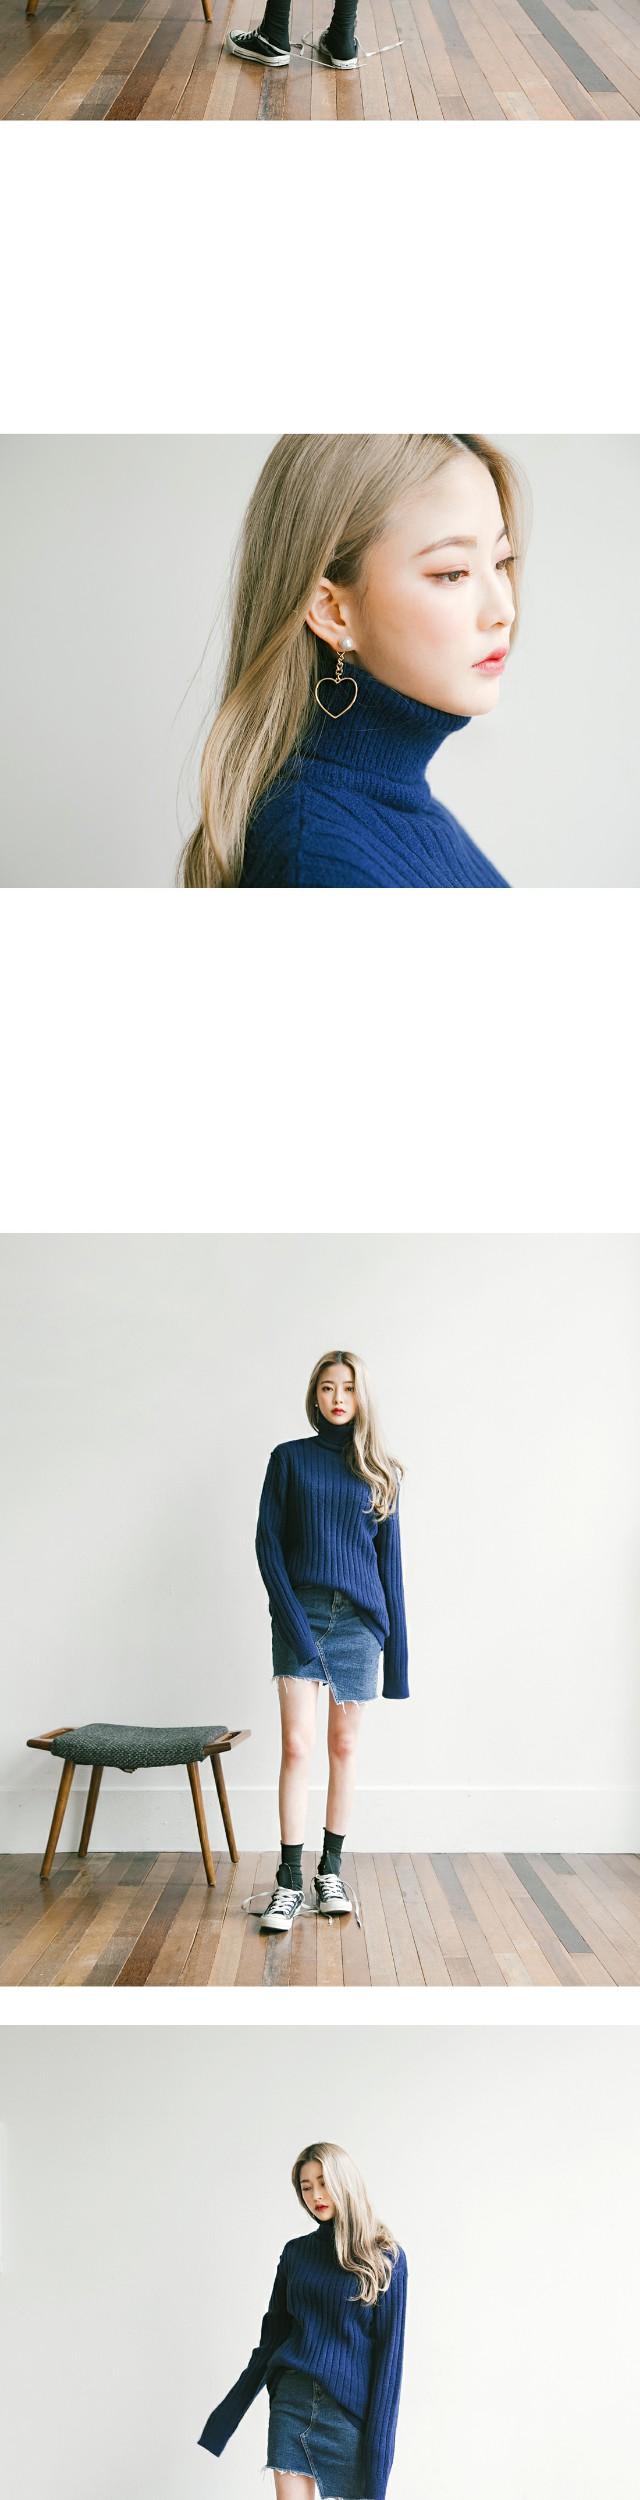 [TOP] RAMS WOOL TURTLE NECK KNIT